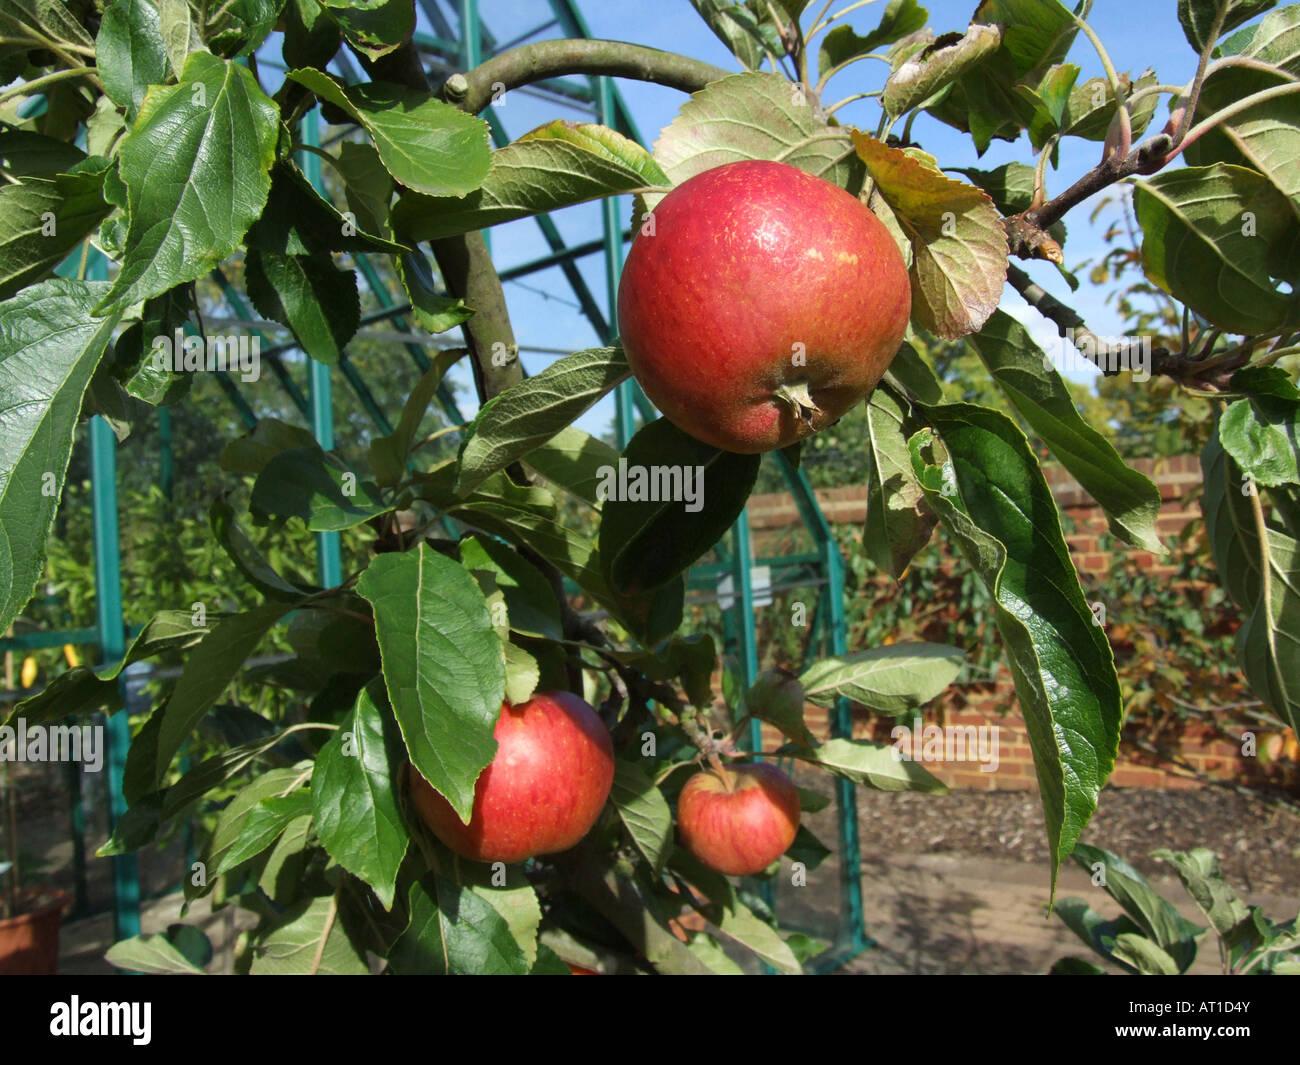 Apple Fiesta Immagini Stock